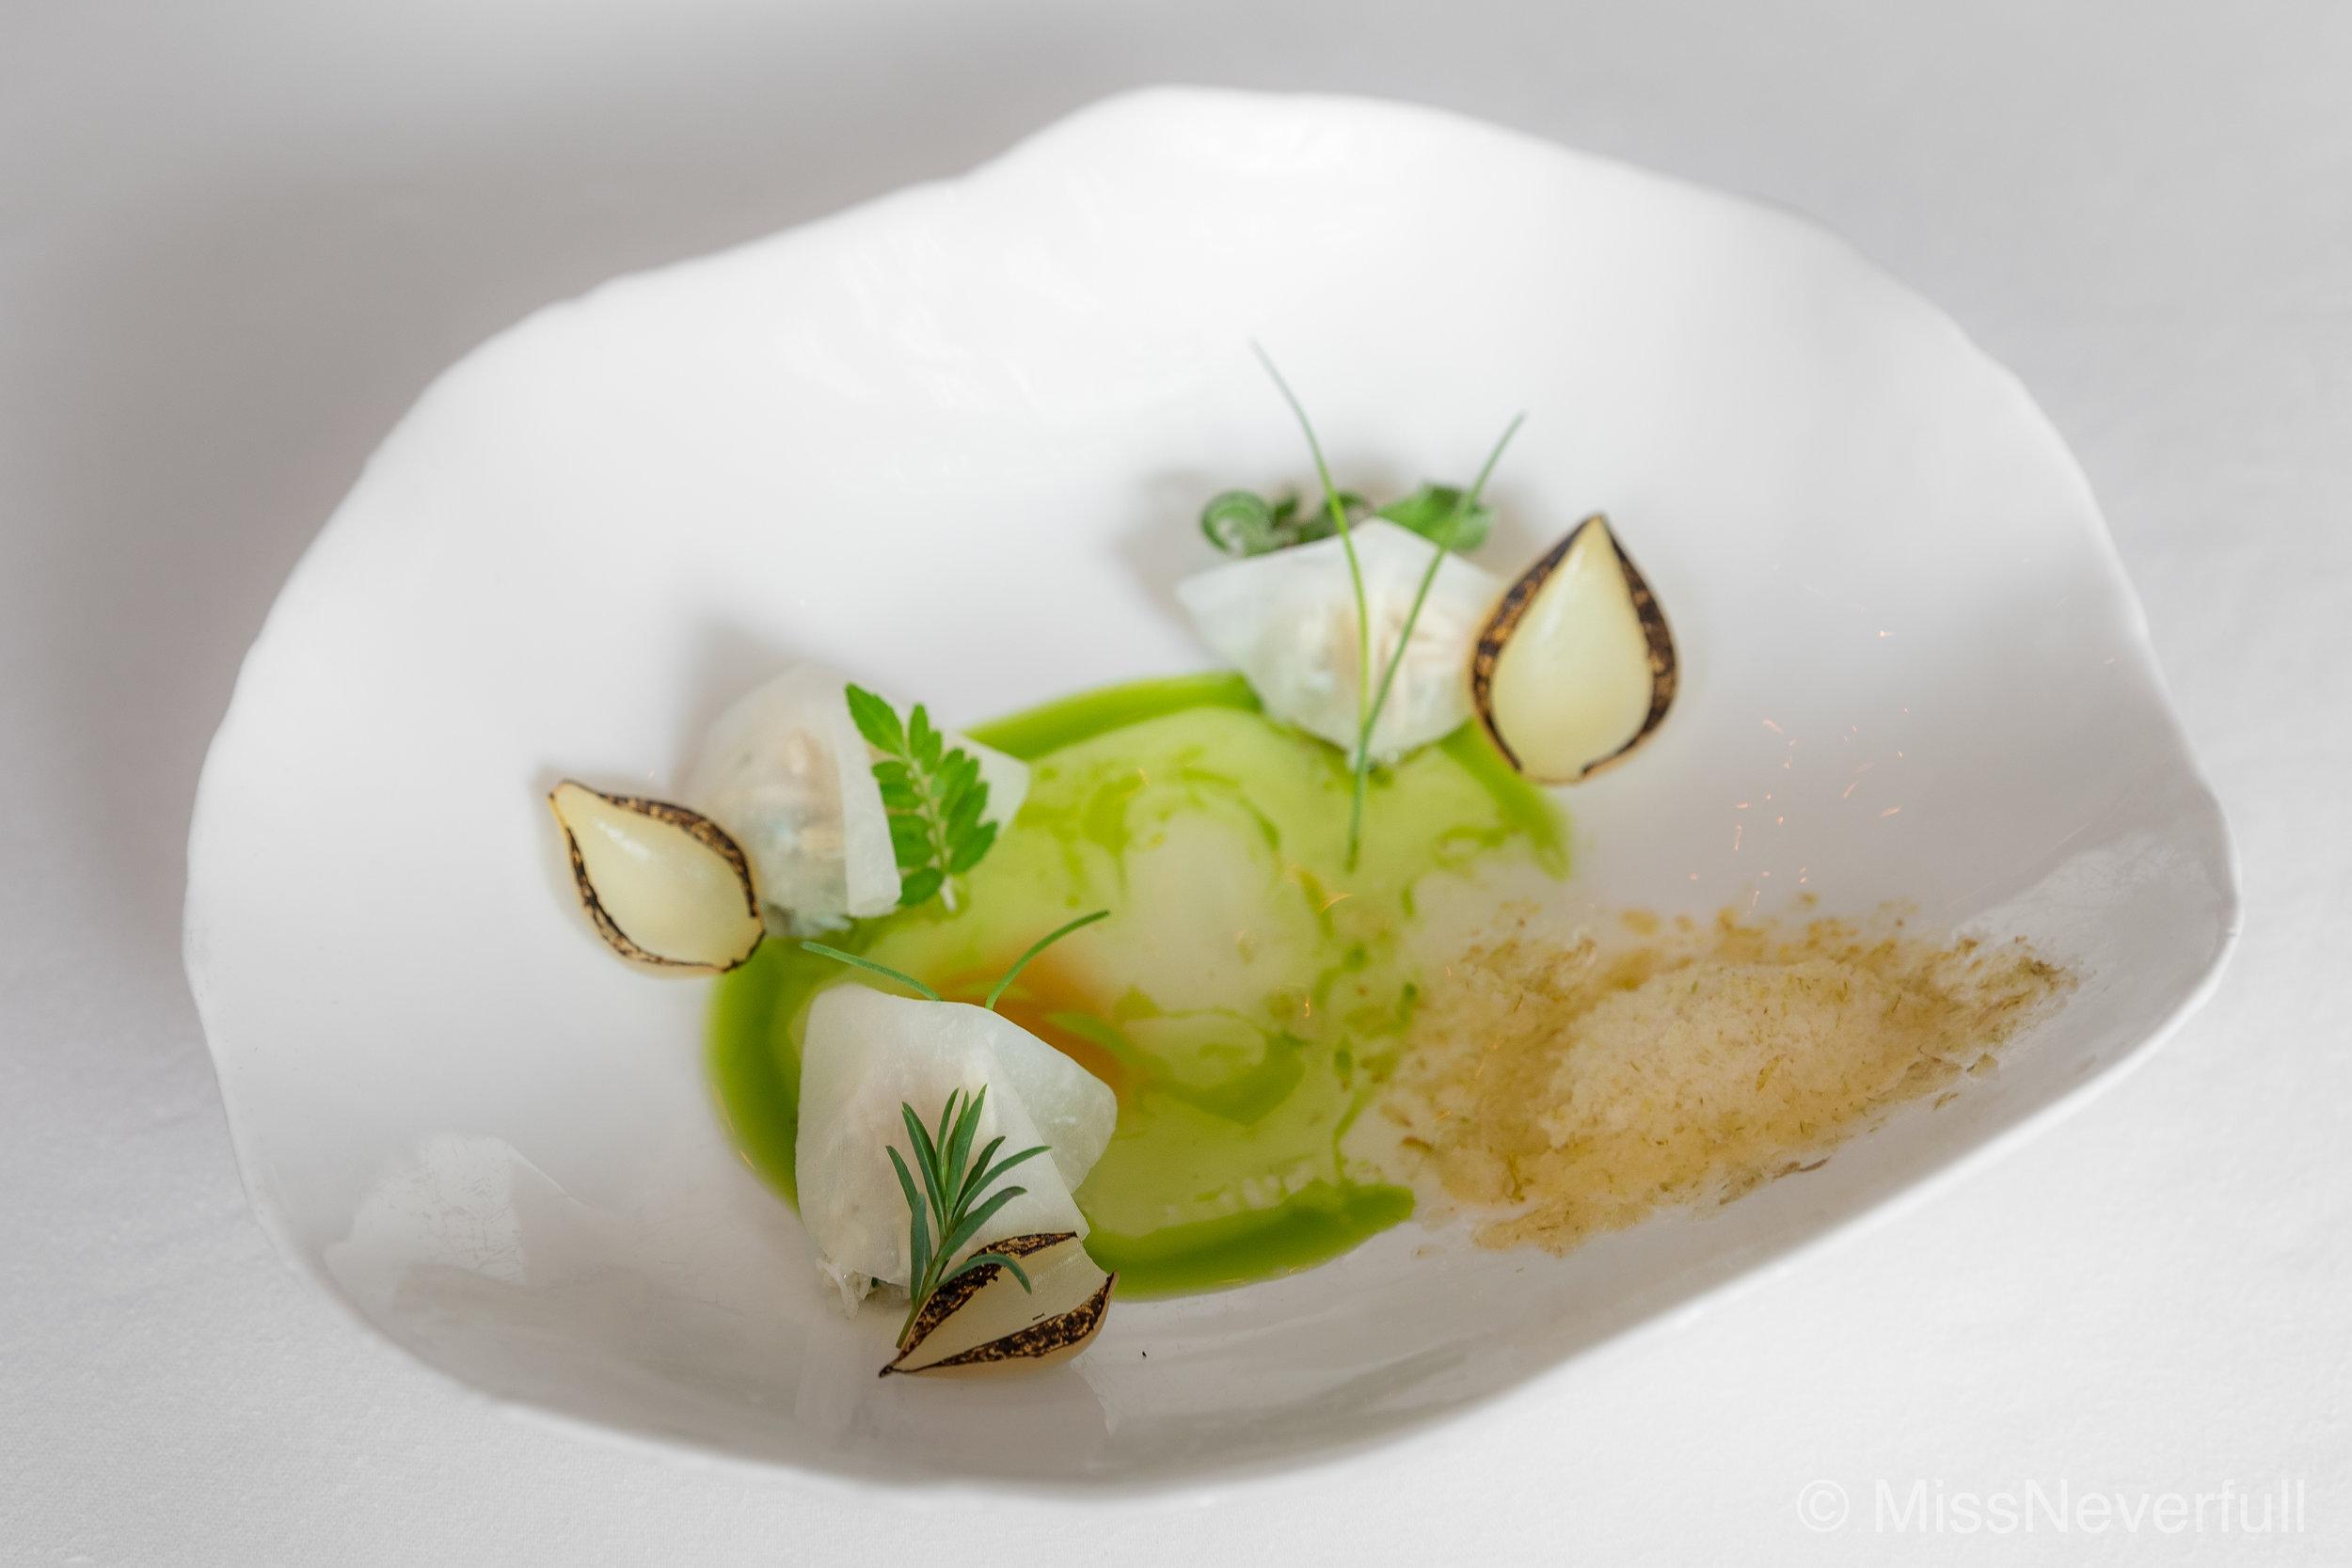 2. PURE: stone crab, leek water, pear snow